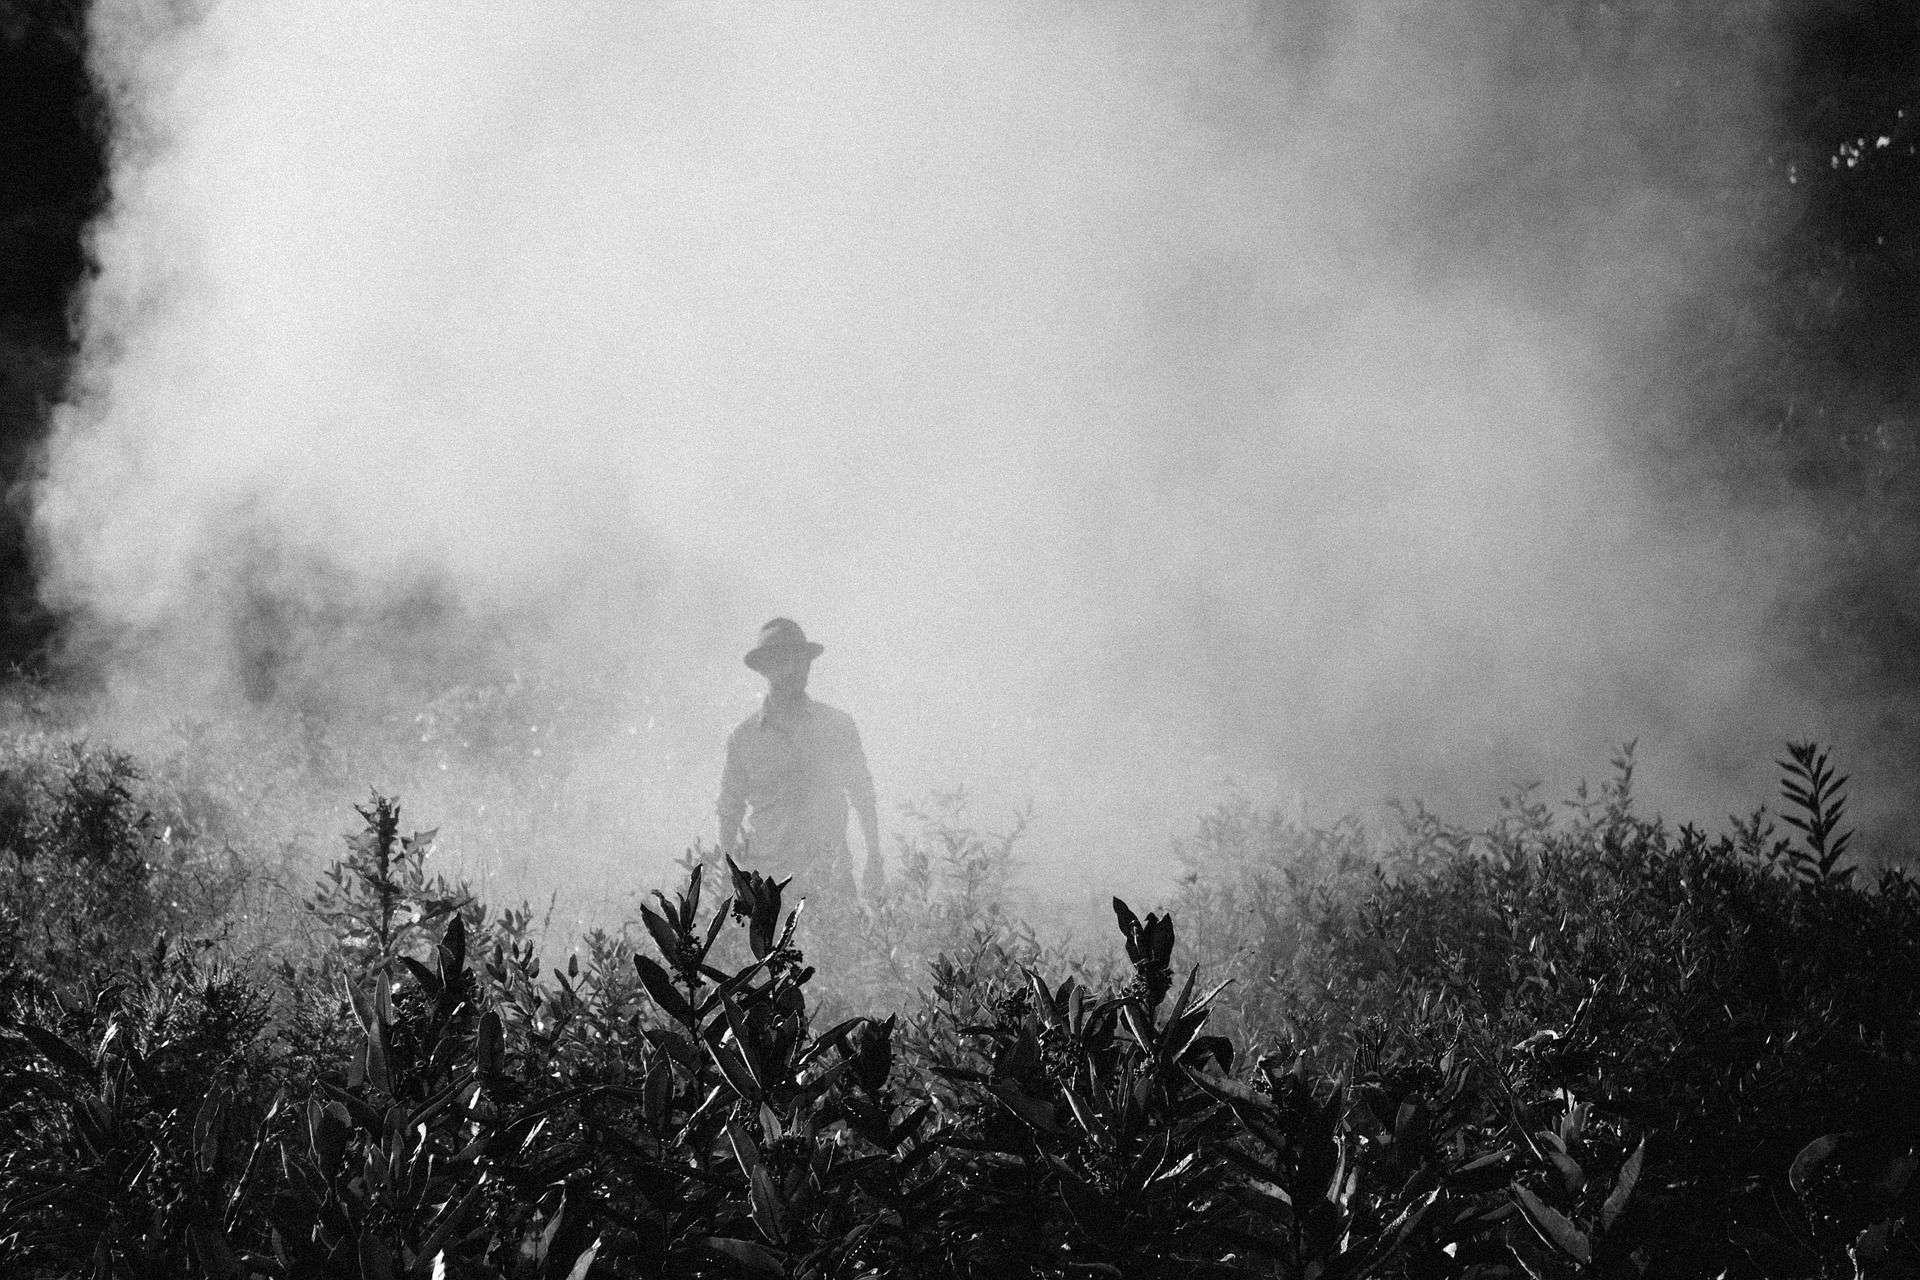 Penggunaan Pestisida di Lahan Pertanian